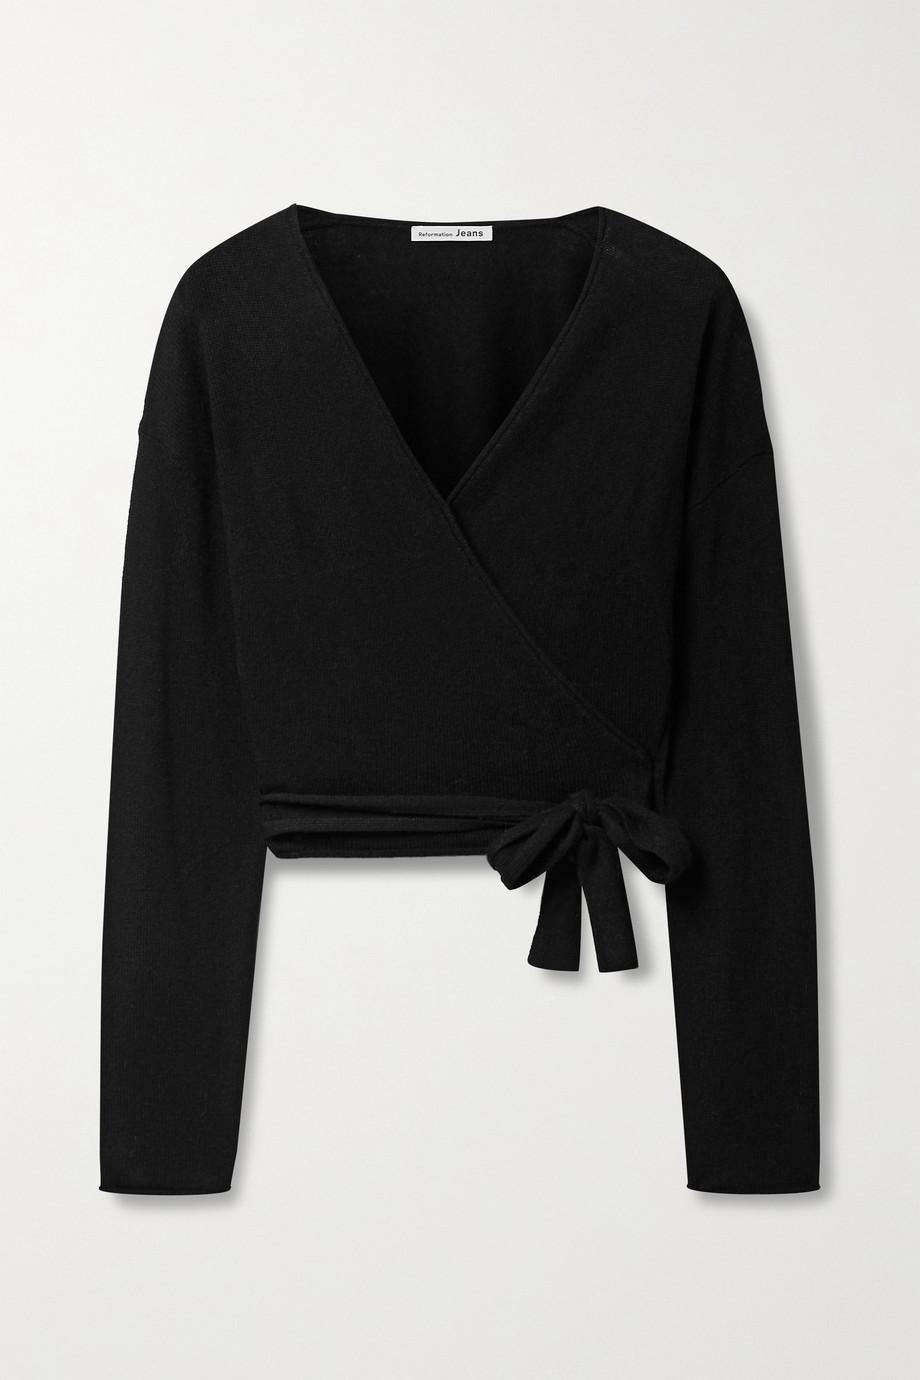 Reformation 羊绒围裹式短款上衣